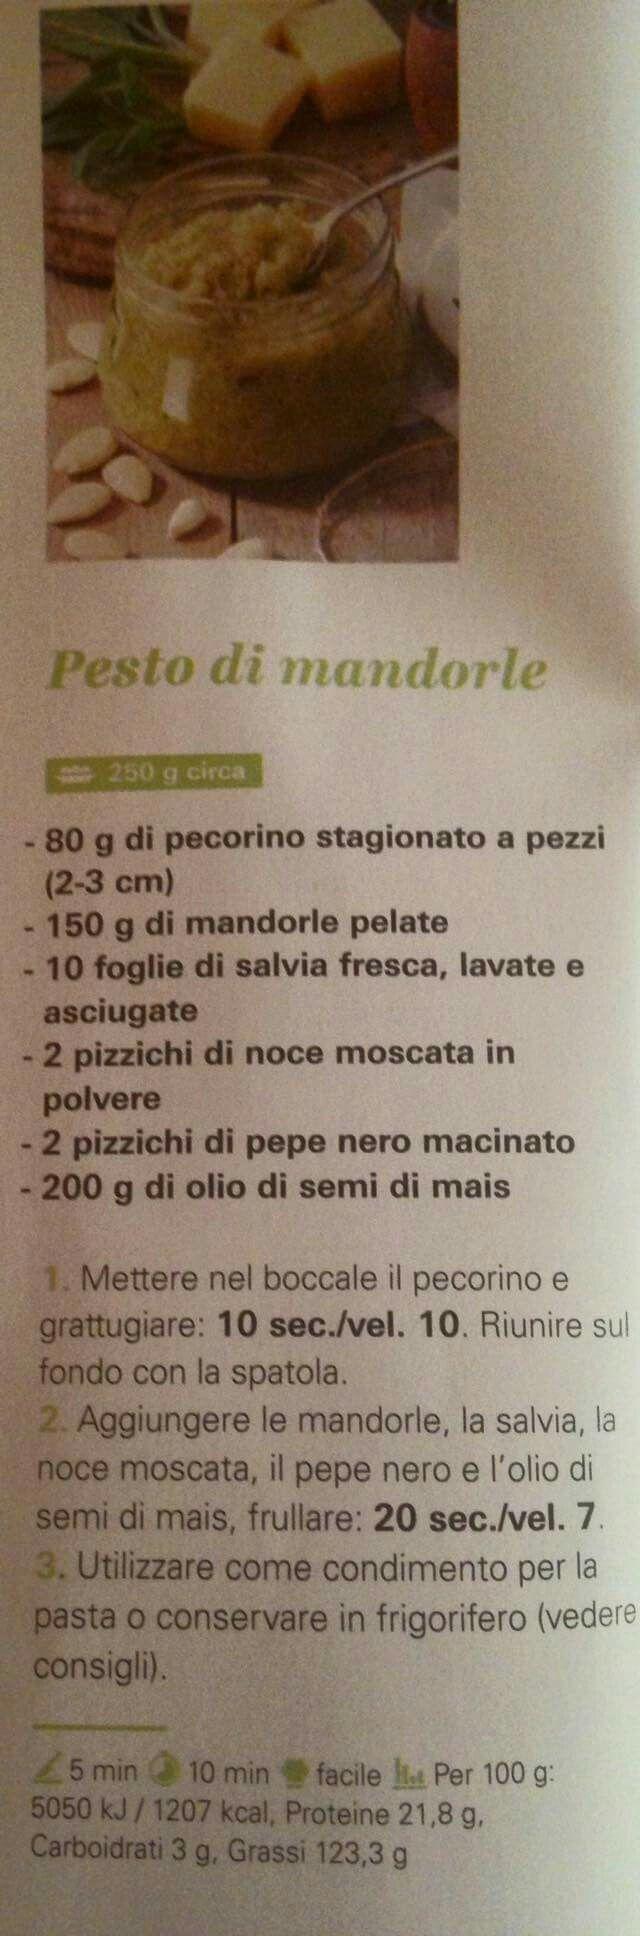 Pesto mandorle